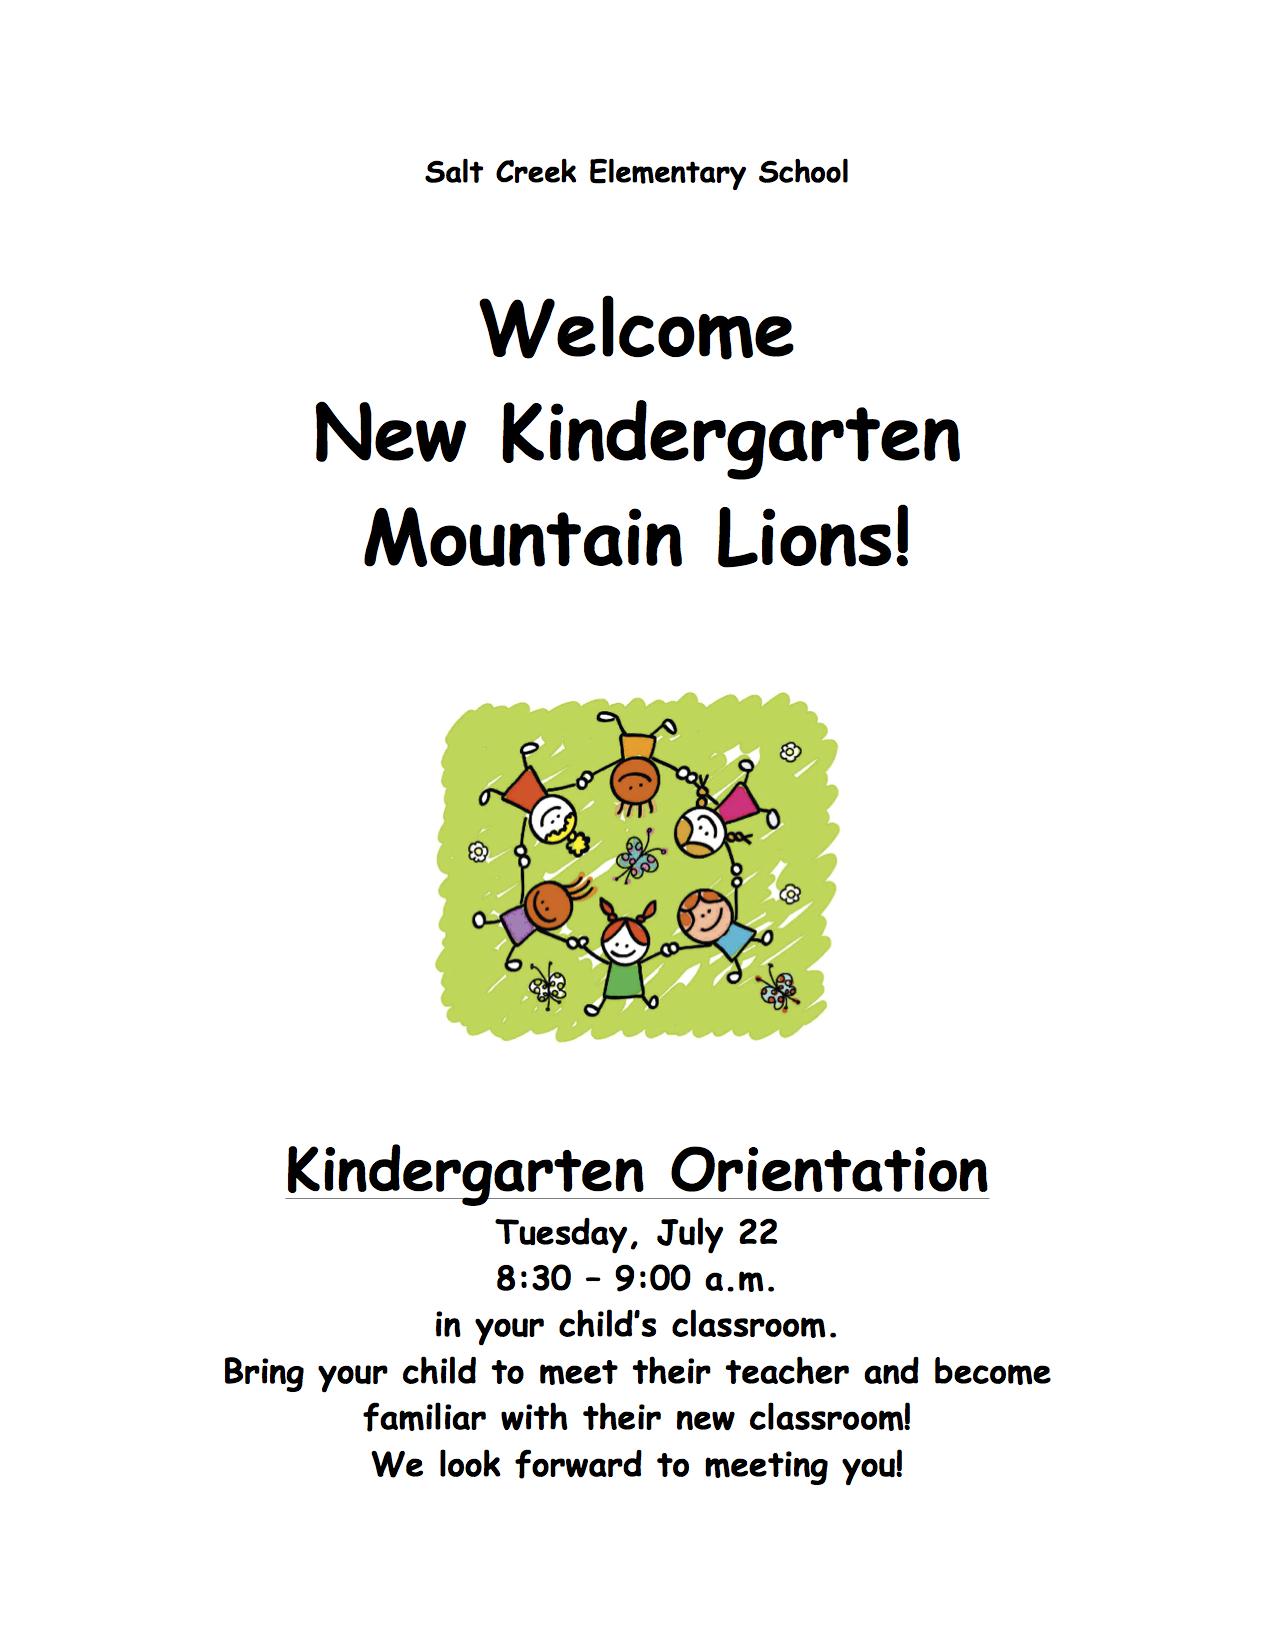 Kindergarten Orientation Tuesday July 22